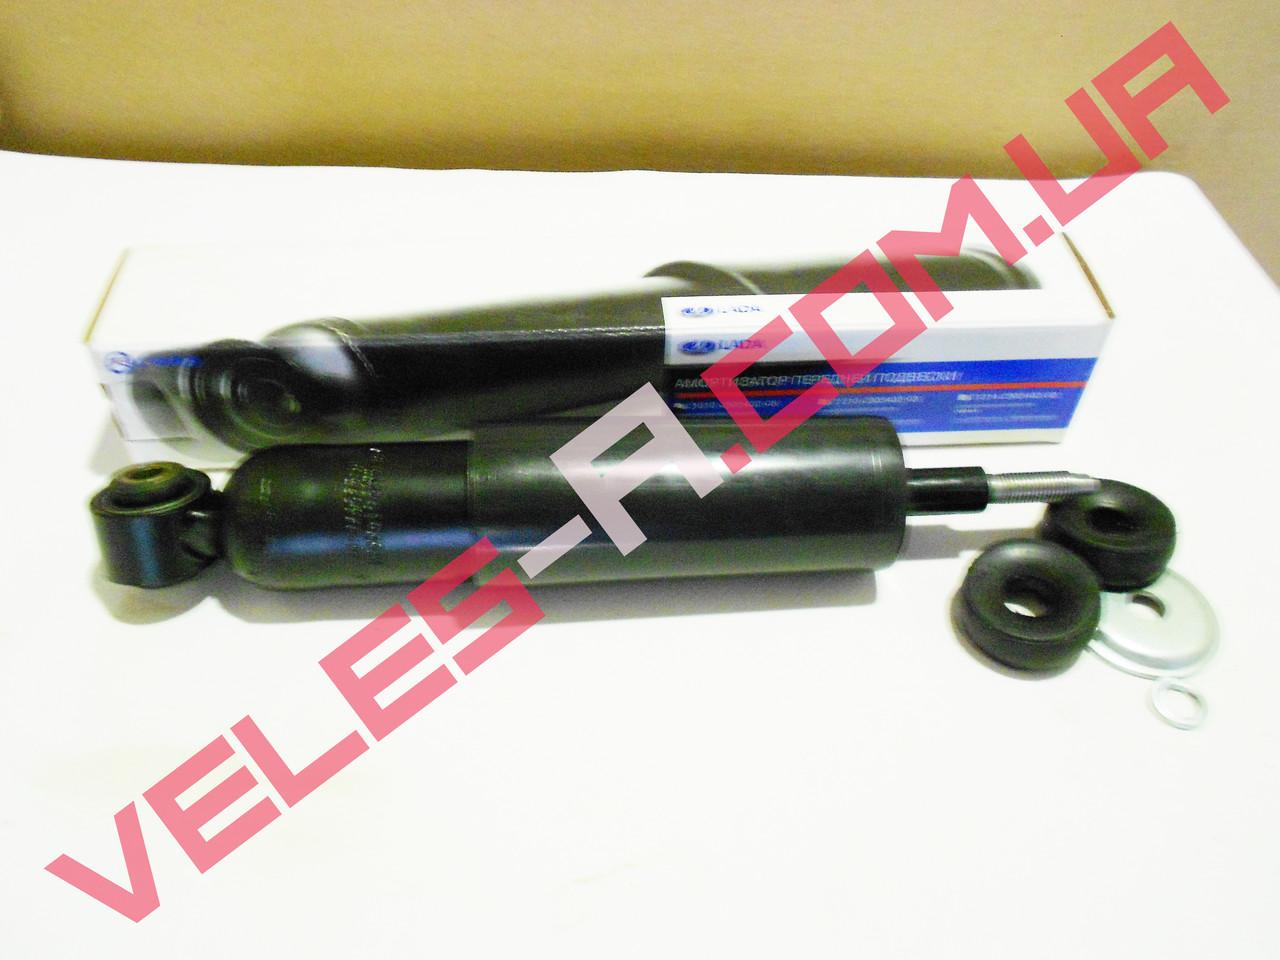 Амортизатор передний Ваз 2101, 2102, 2103, 2104, 2105, 2106, 2107 (масло) СААЗ